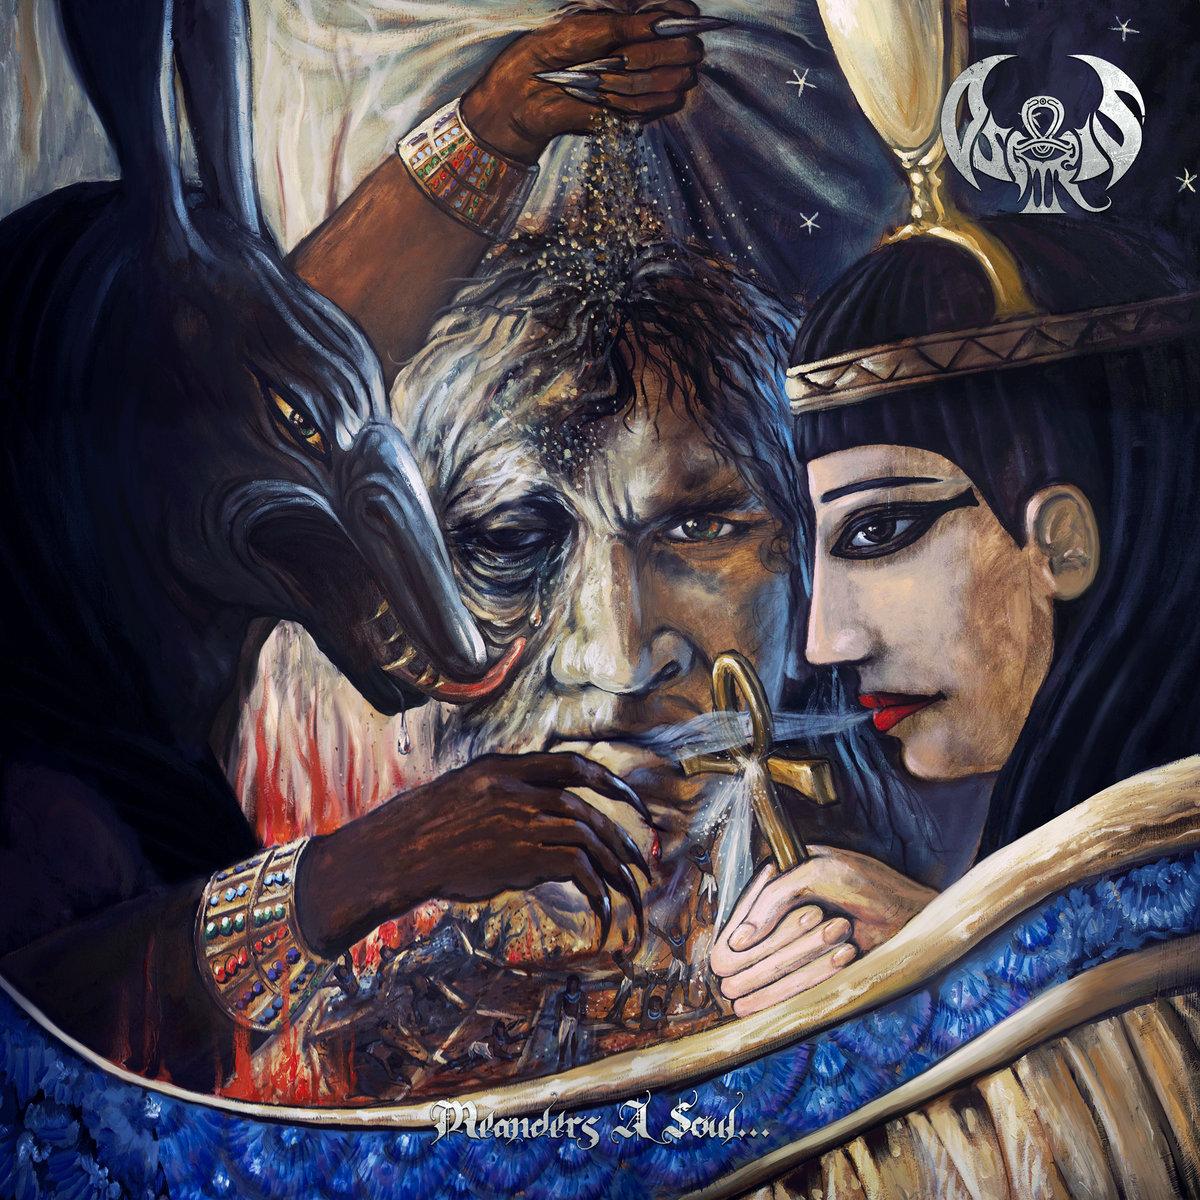 Osiris Meanders A Soul Album Cover Artwork